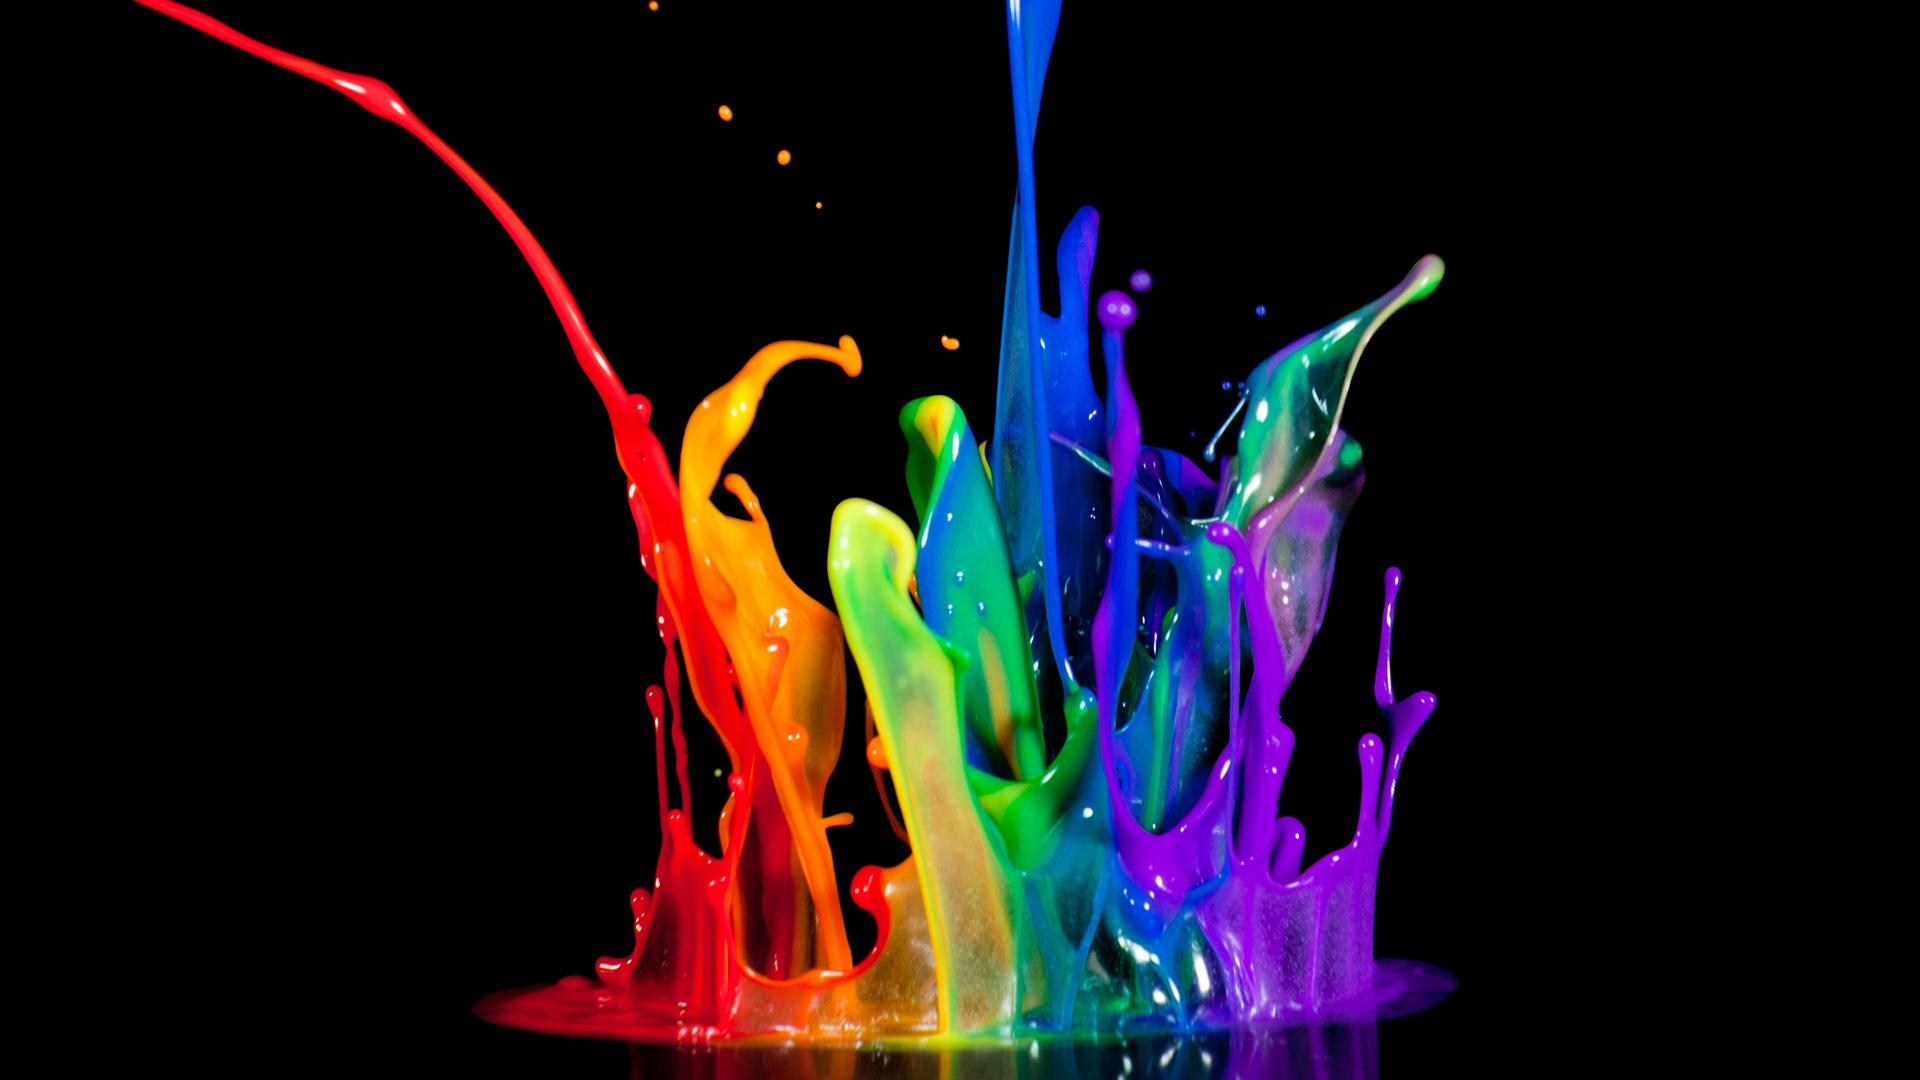 hd wallpapers painting wallpaper paint splash artistic desktop 1920 1920x1080